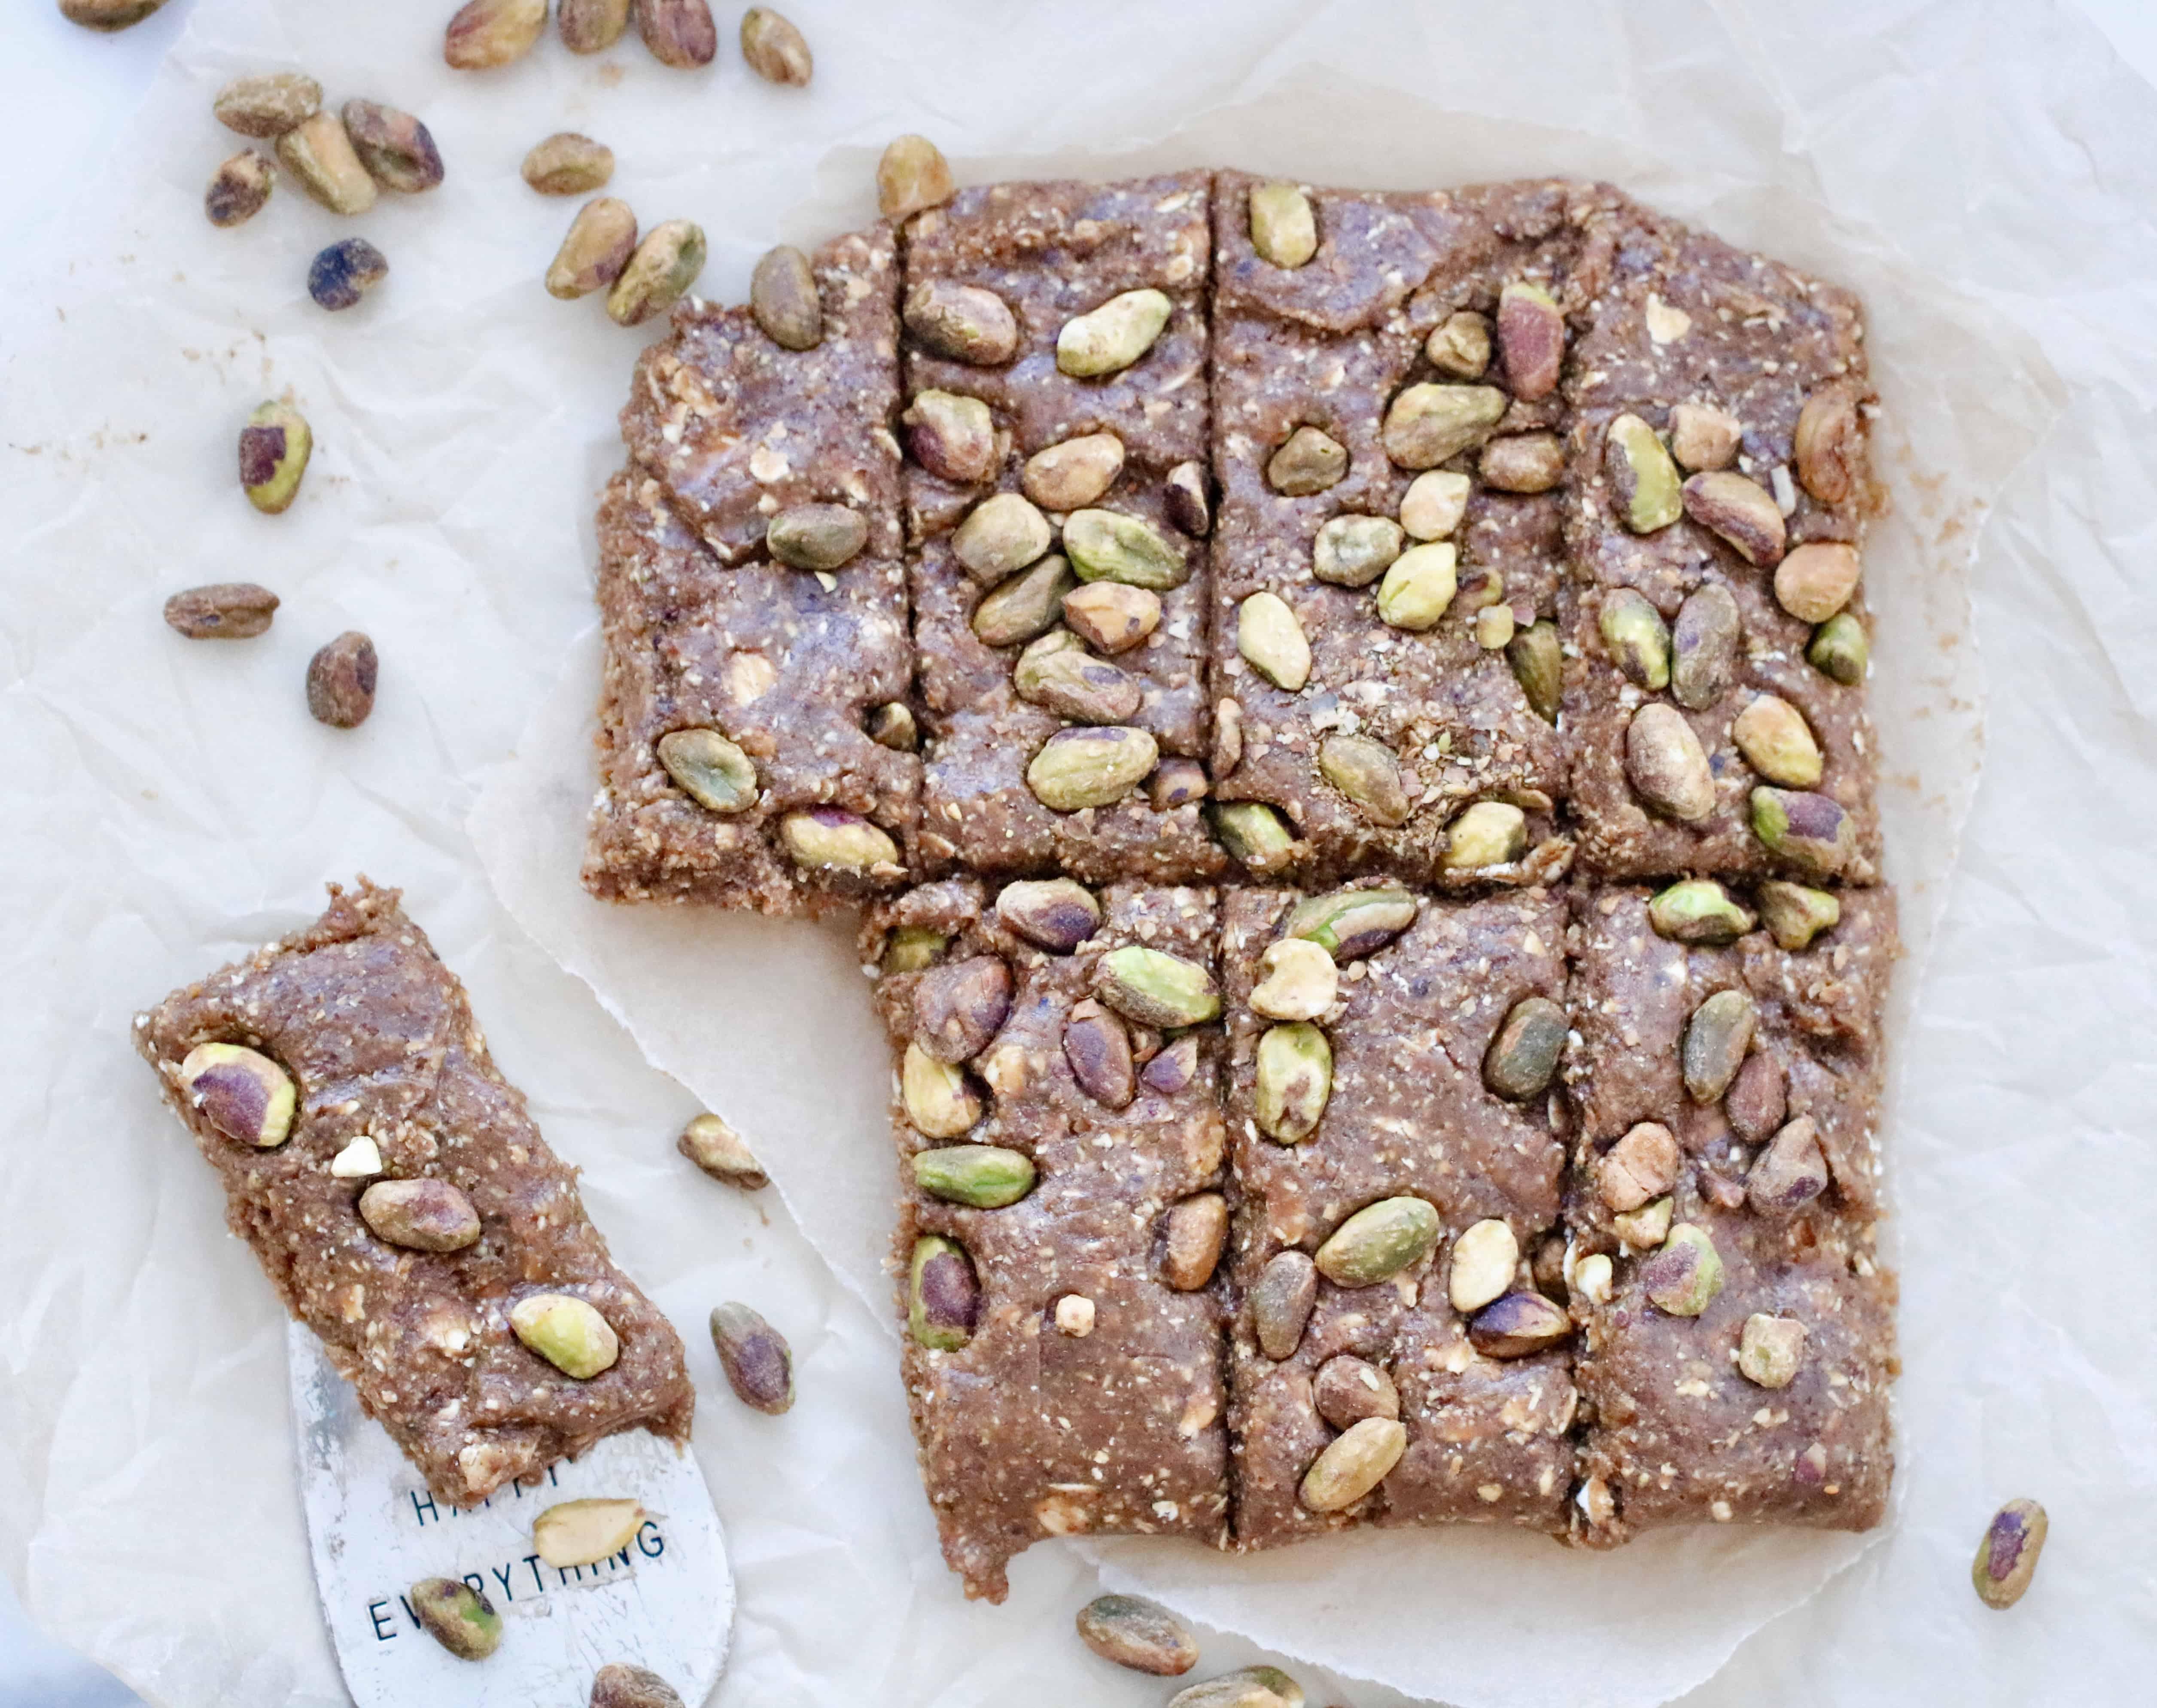 Mediterranean Pistachio No Bake Snack Bars - Vegan & Gluten Free @shawsimpleswaps